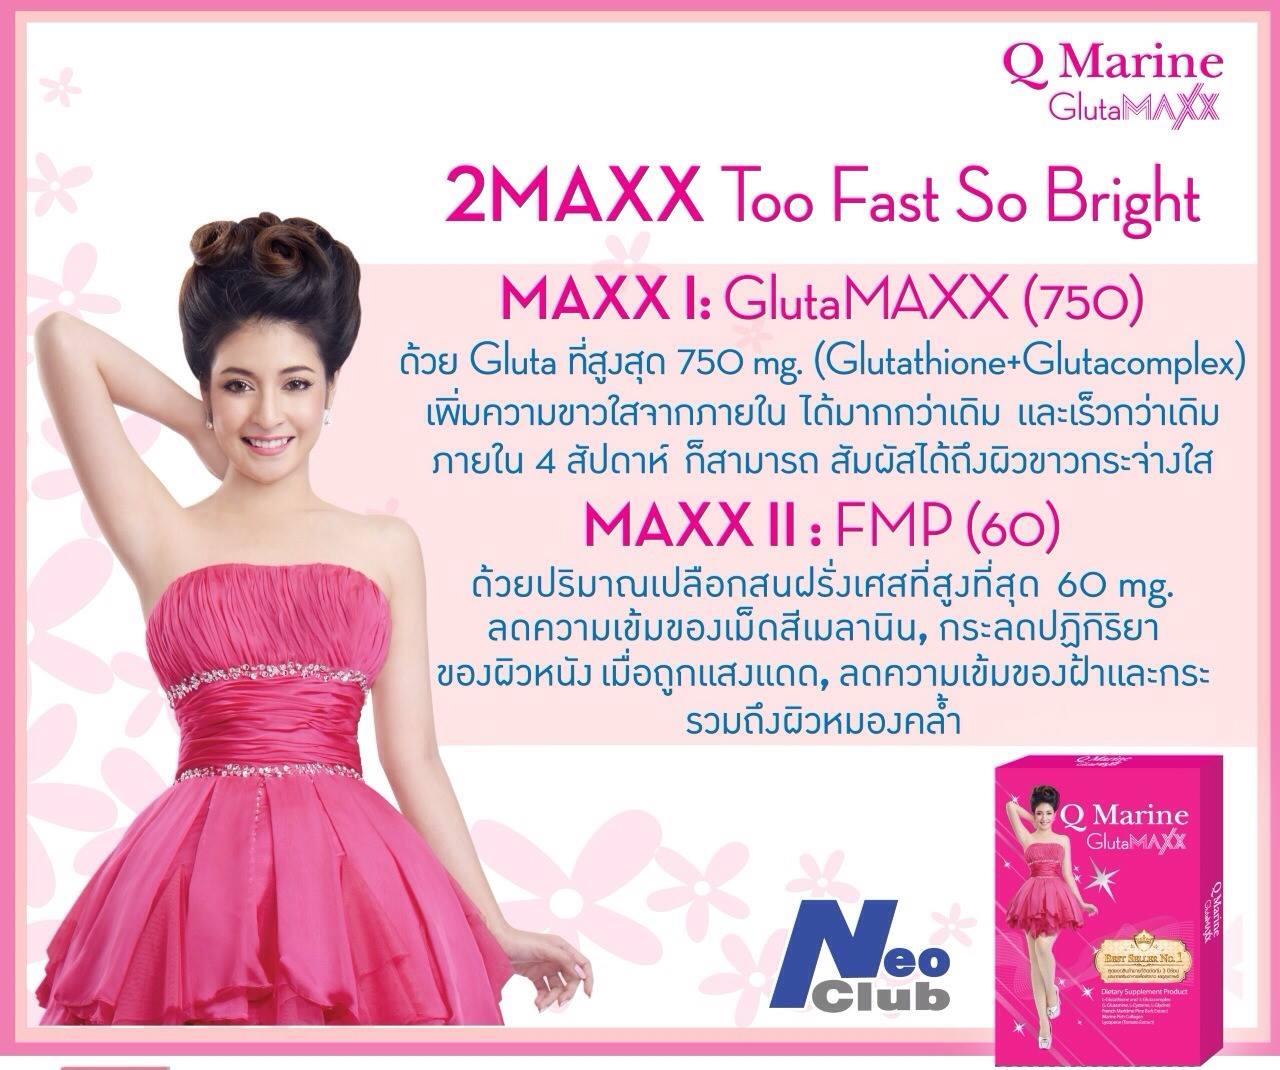 Q Marine Gluta Maxx Watson LnwMarket - Social Sho...